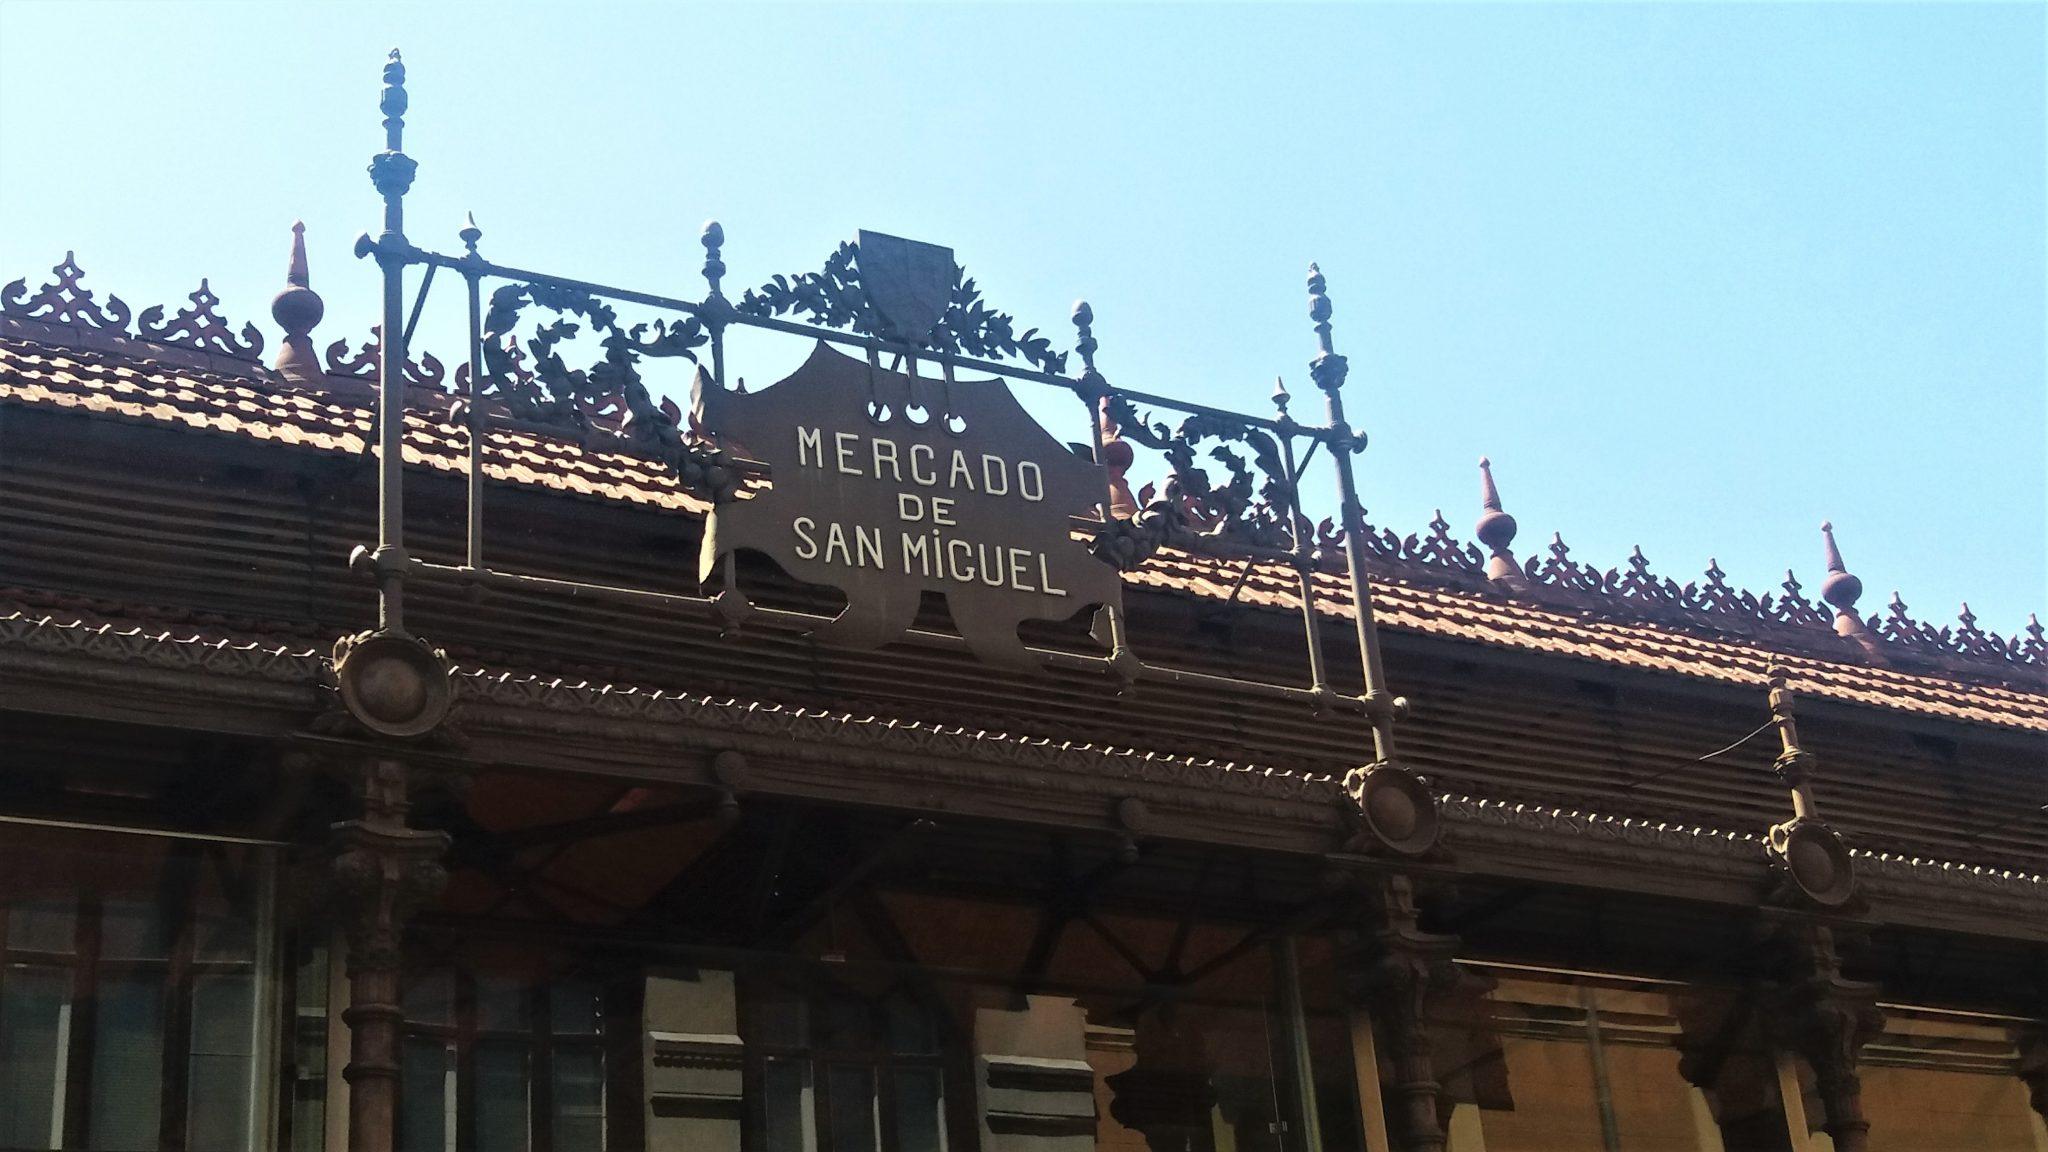 Mercado San Miguel, O Piață Tradițională Spaniolă!